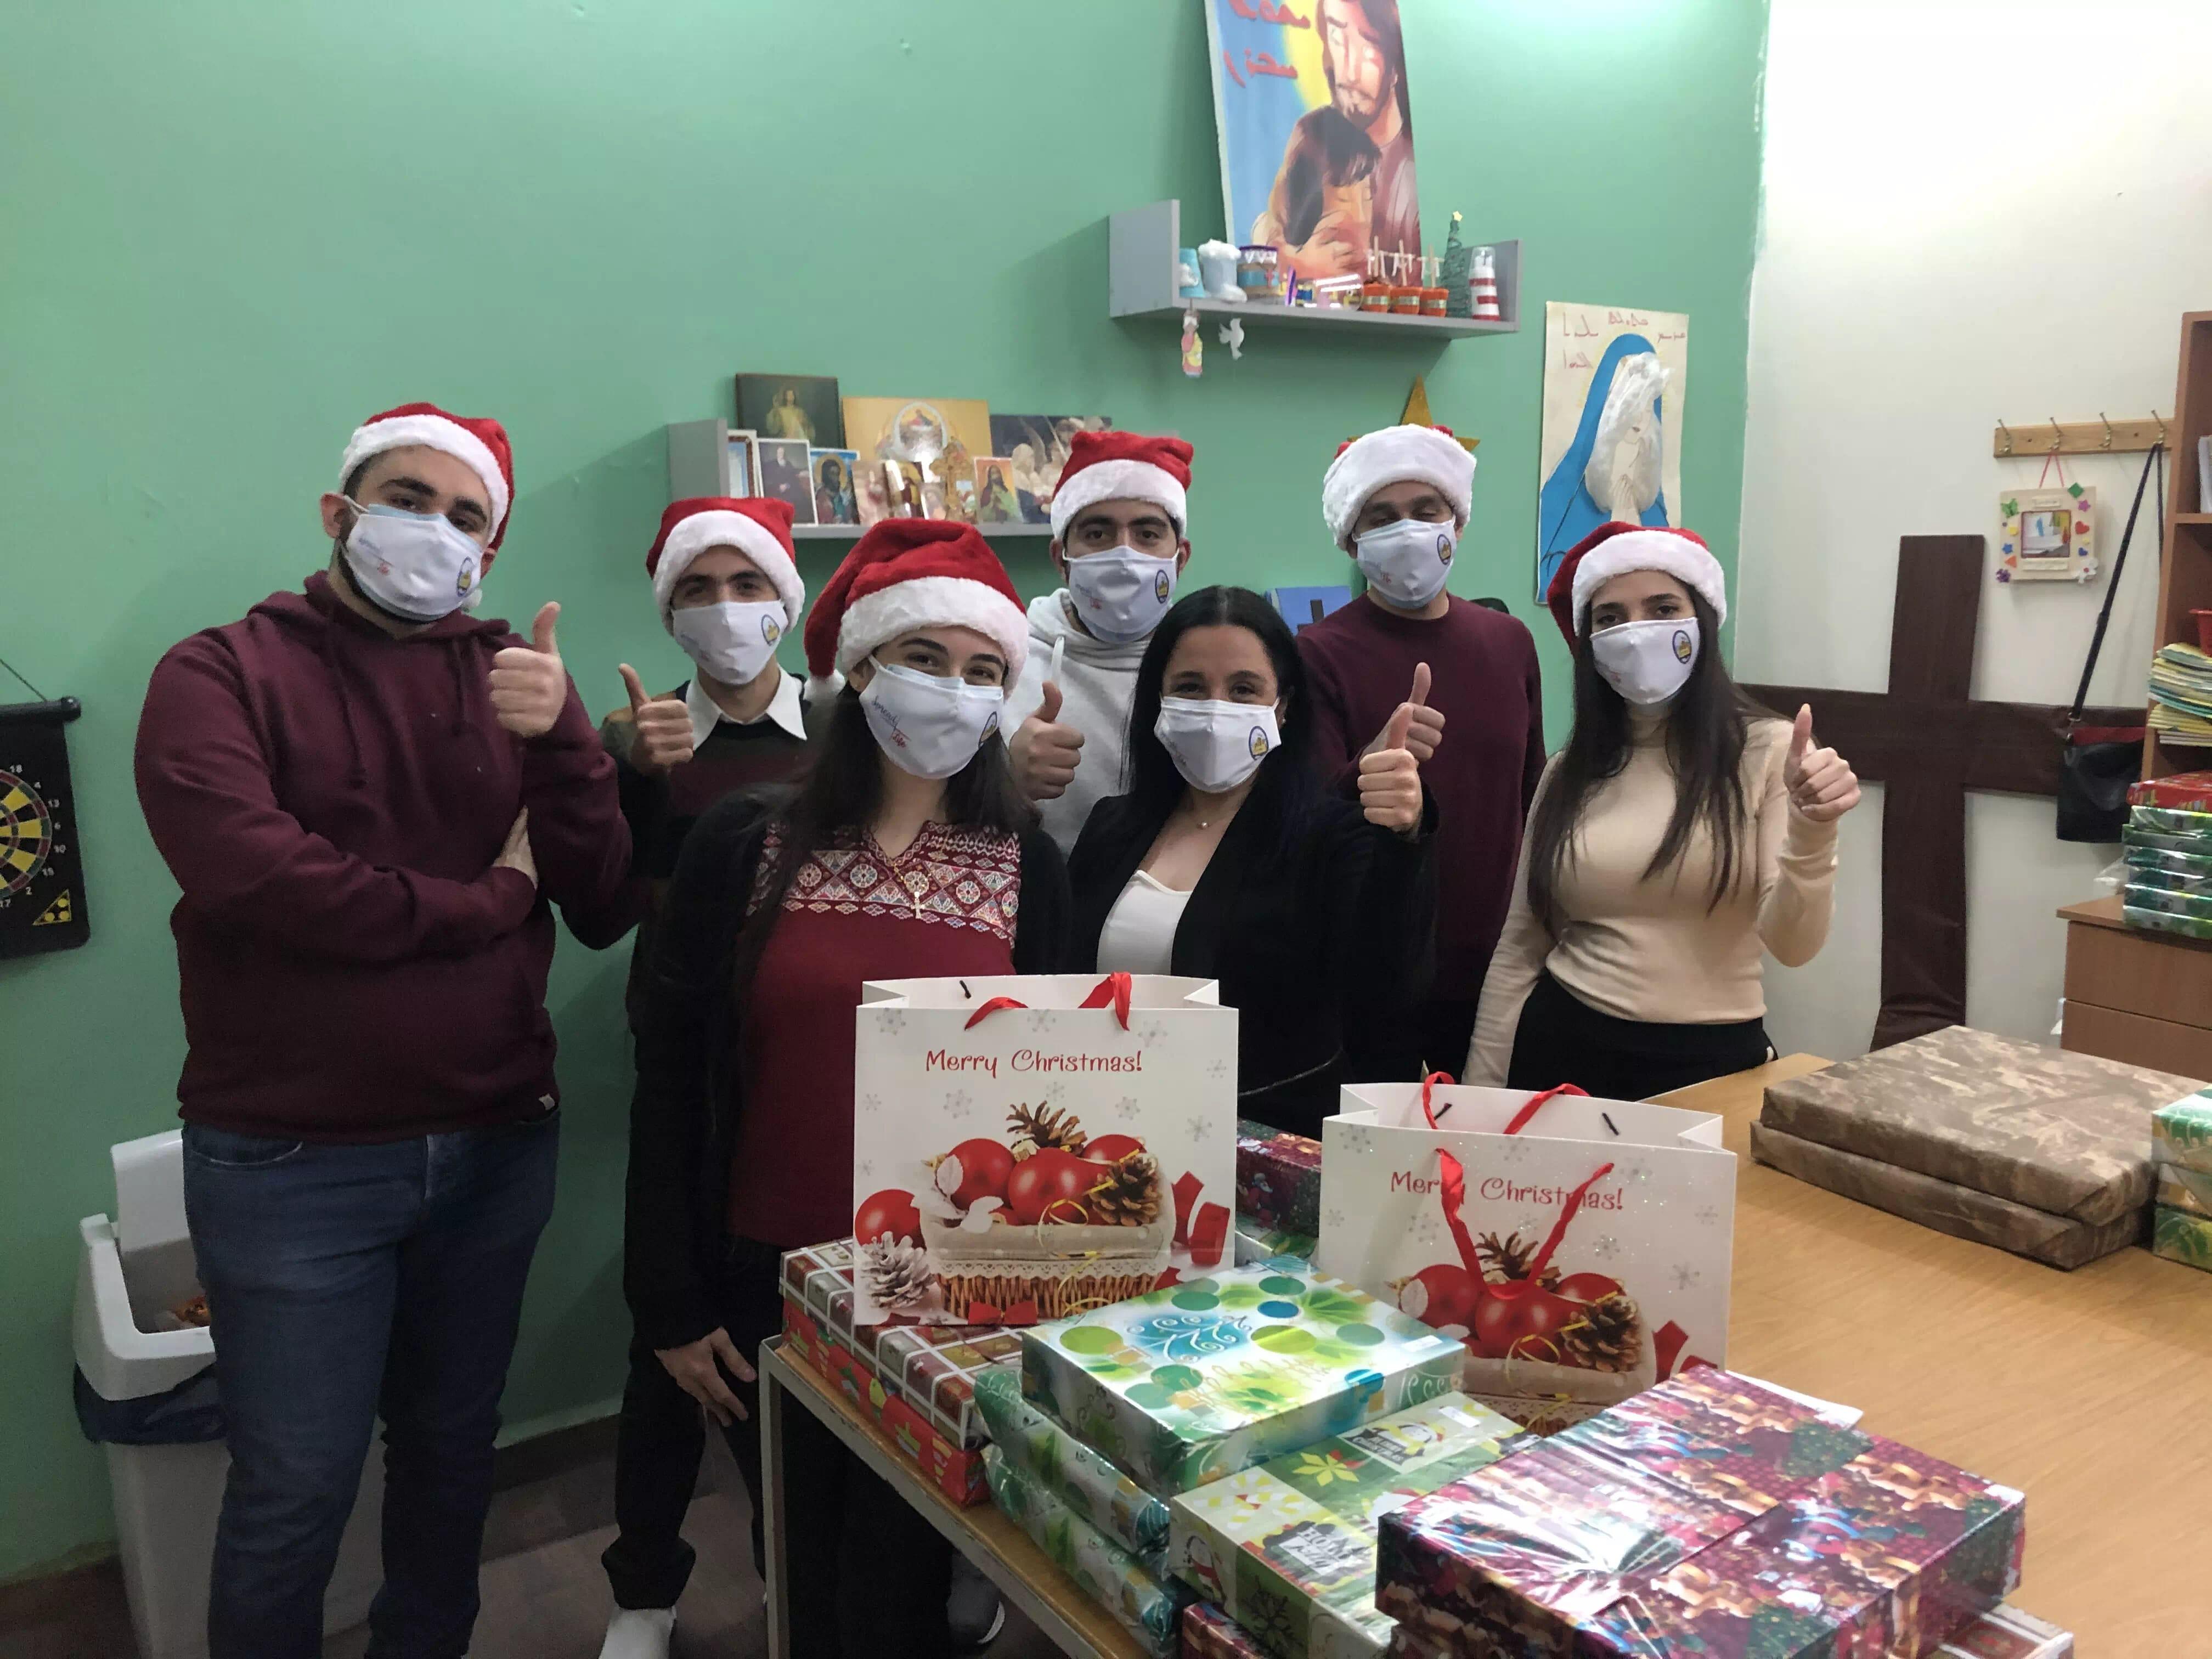 https://eundemia.sirv.com/Images/christmas/456824.webp